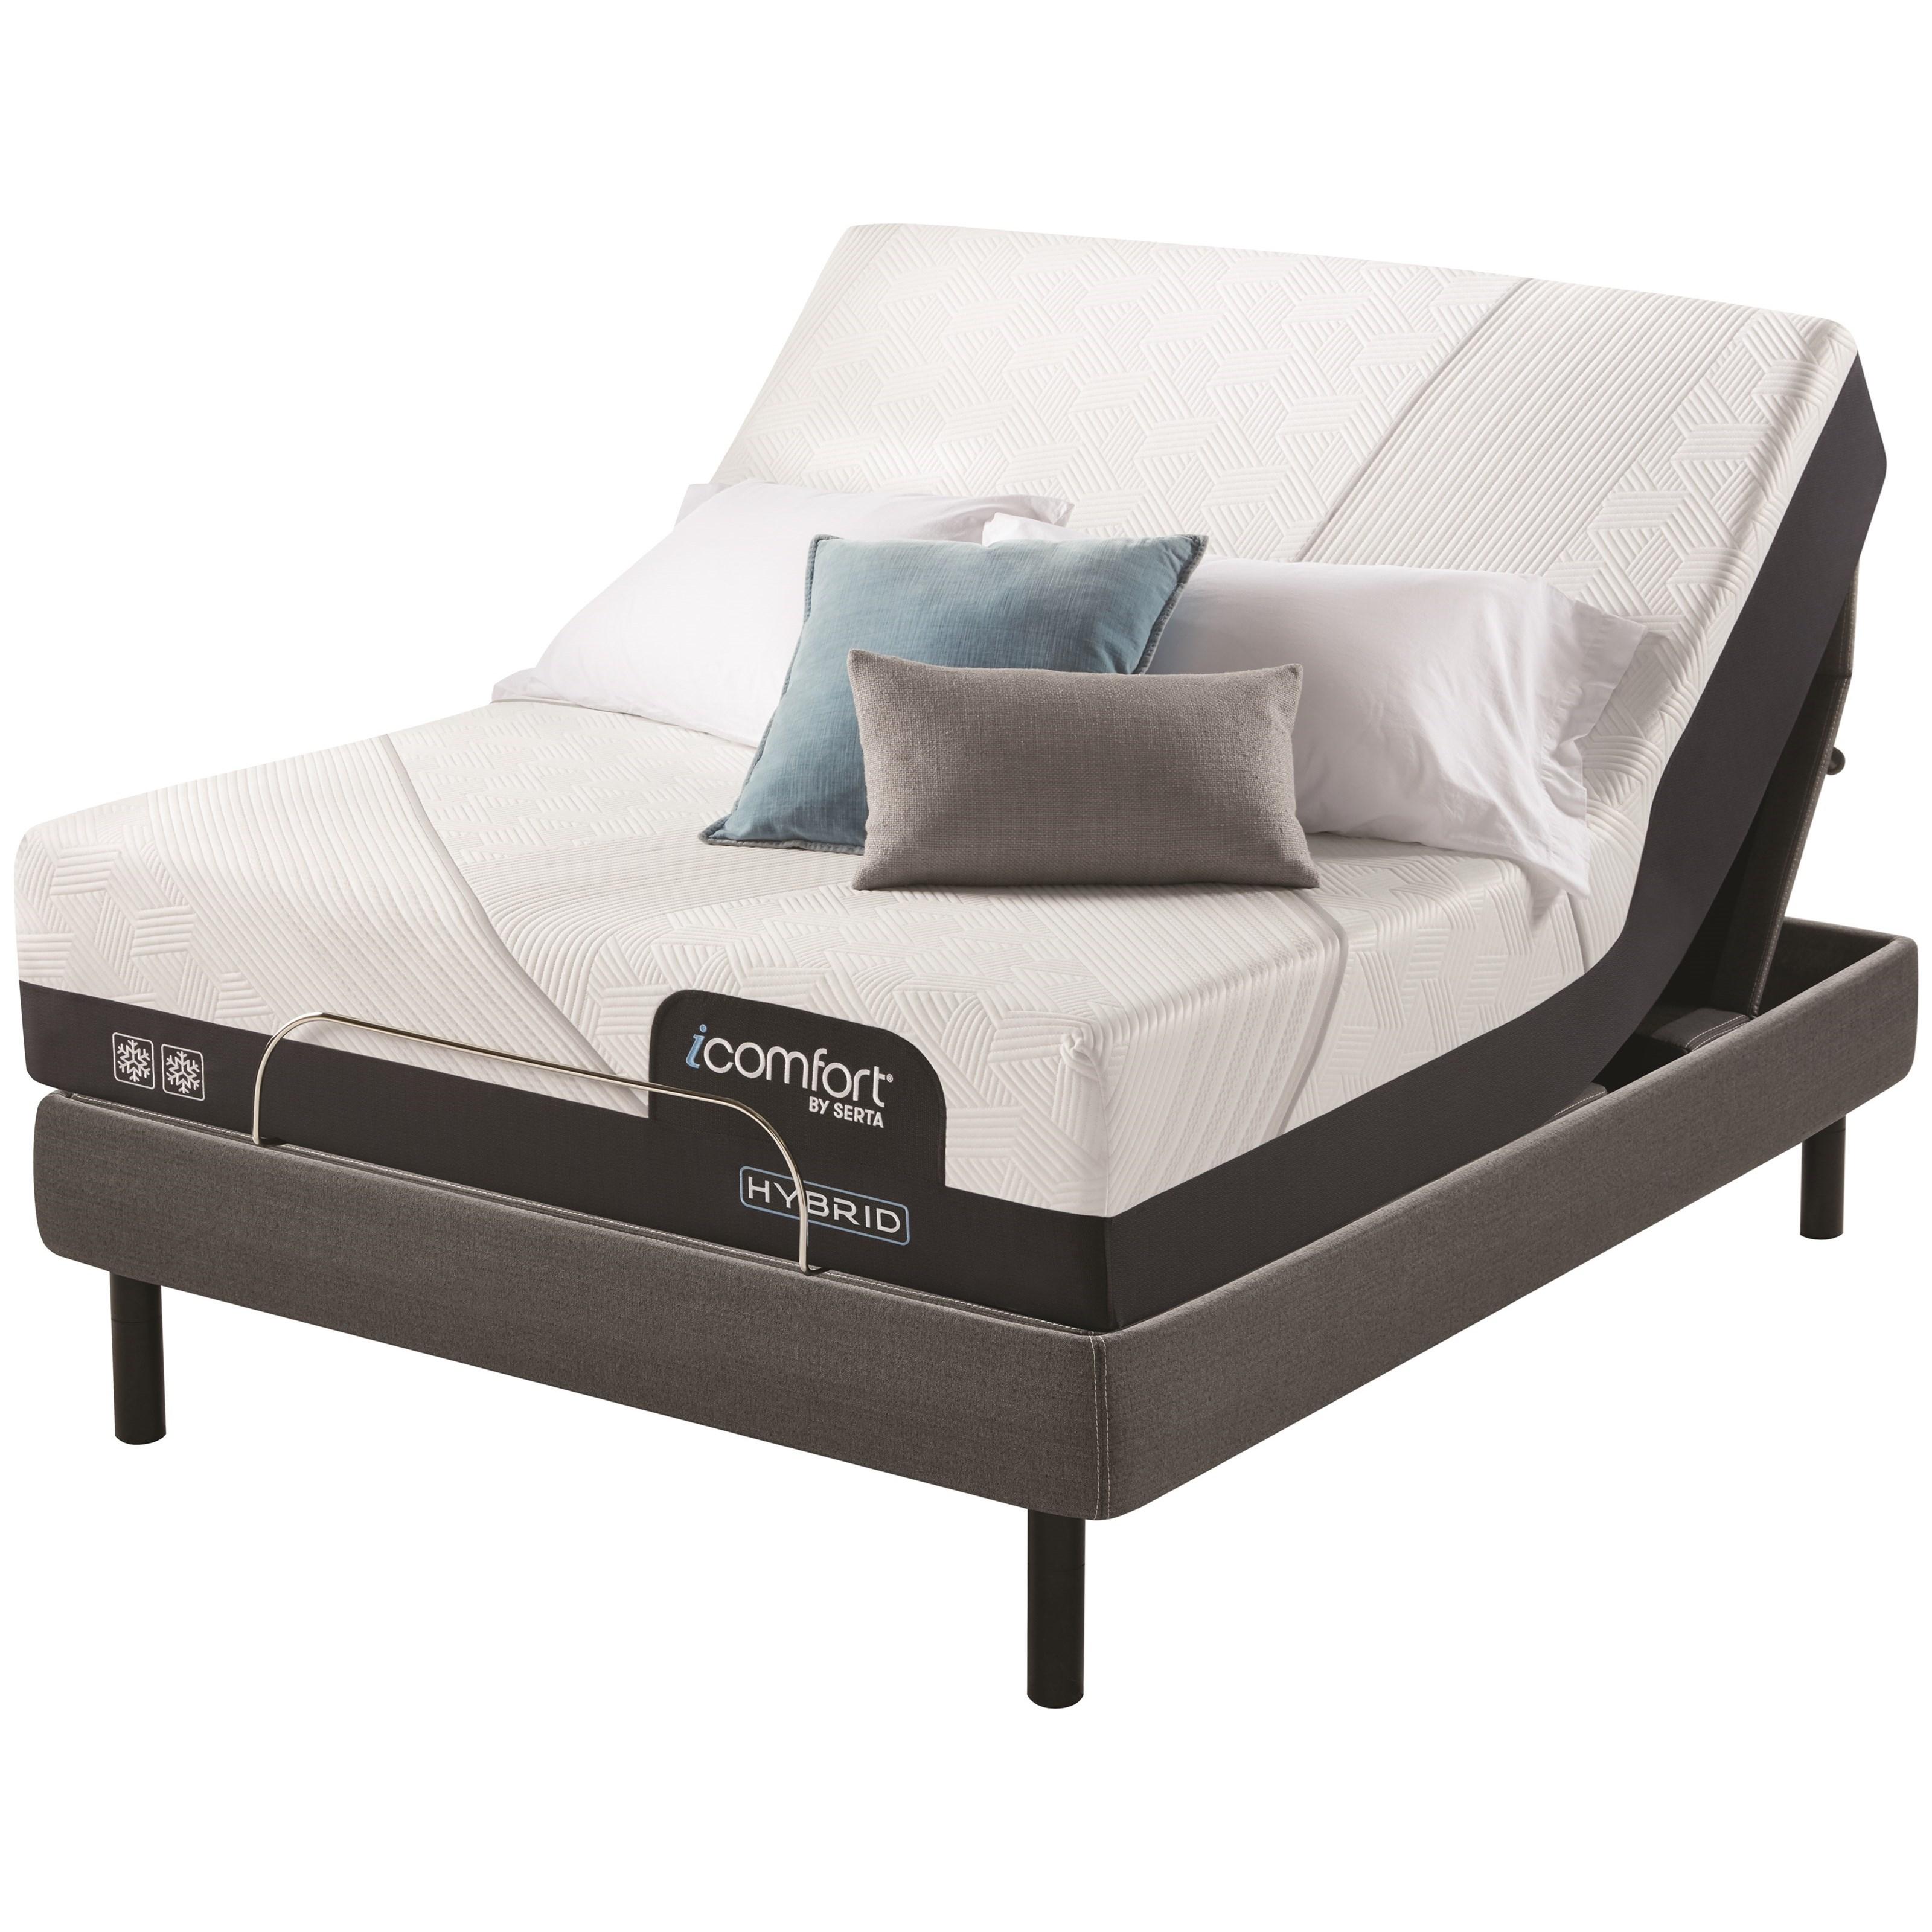 "CF2000 Hybrid Firm Queen 12 1/2"" Firm Hybrid Adj Set by Serta at Miller Waldrop Furniture and Decor"